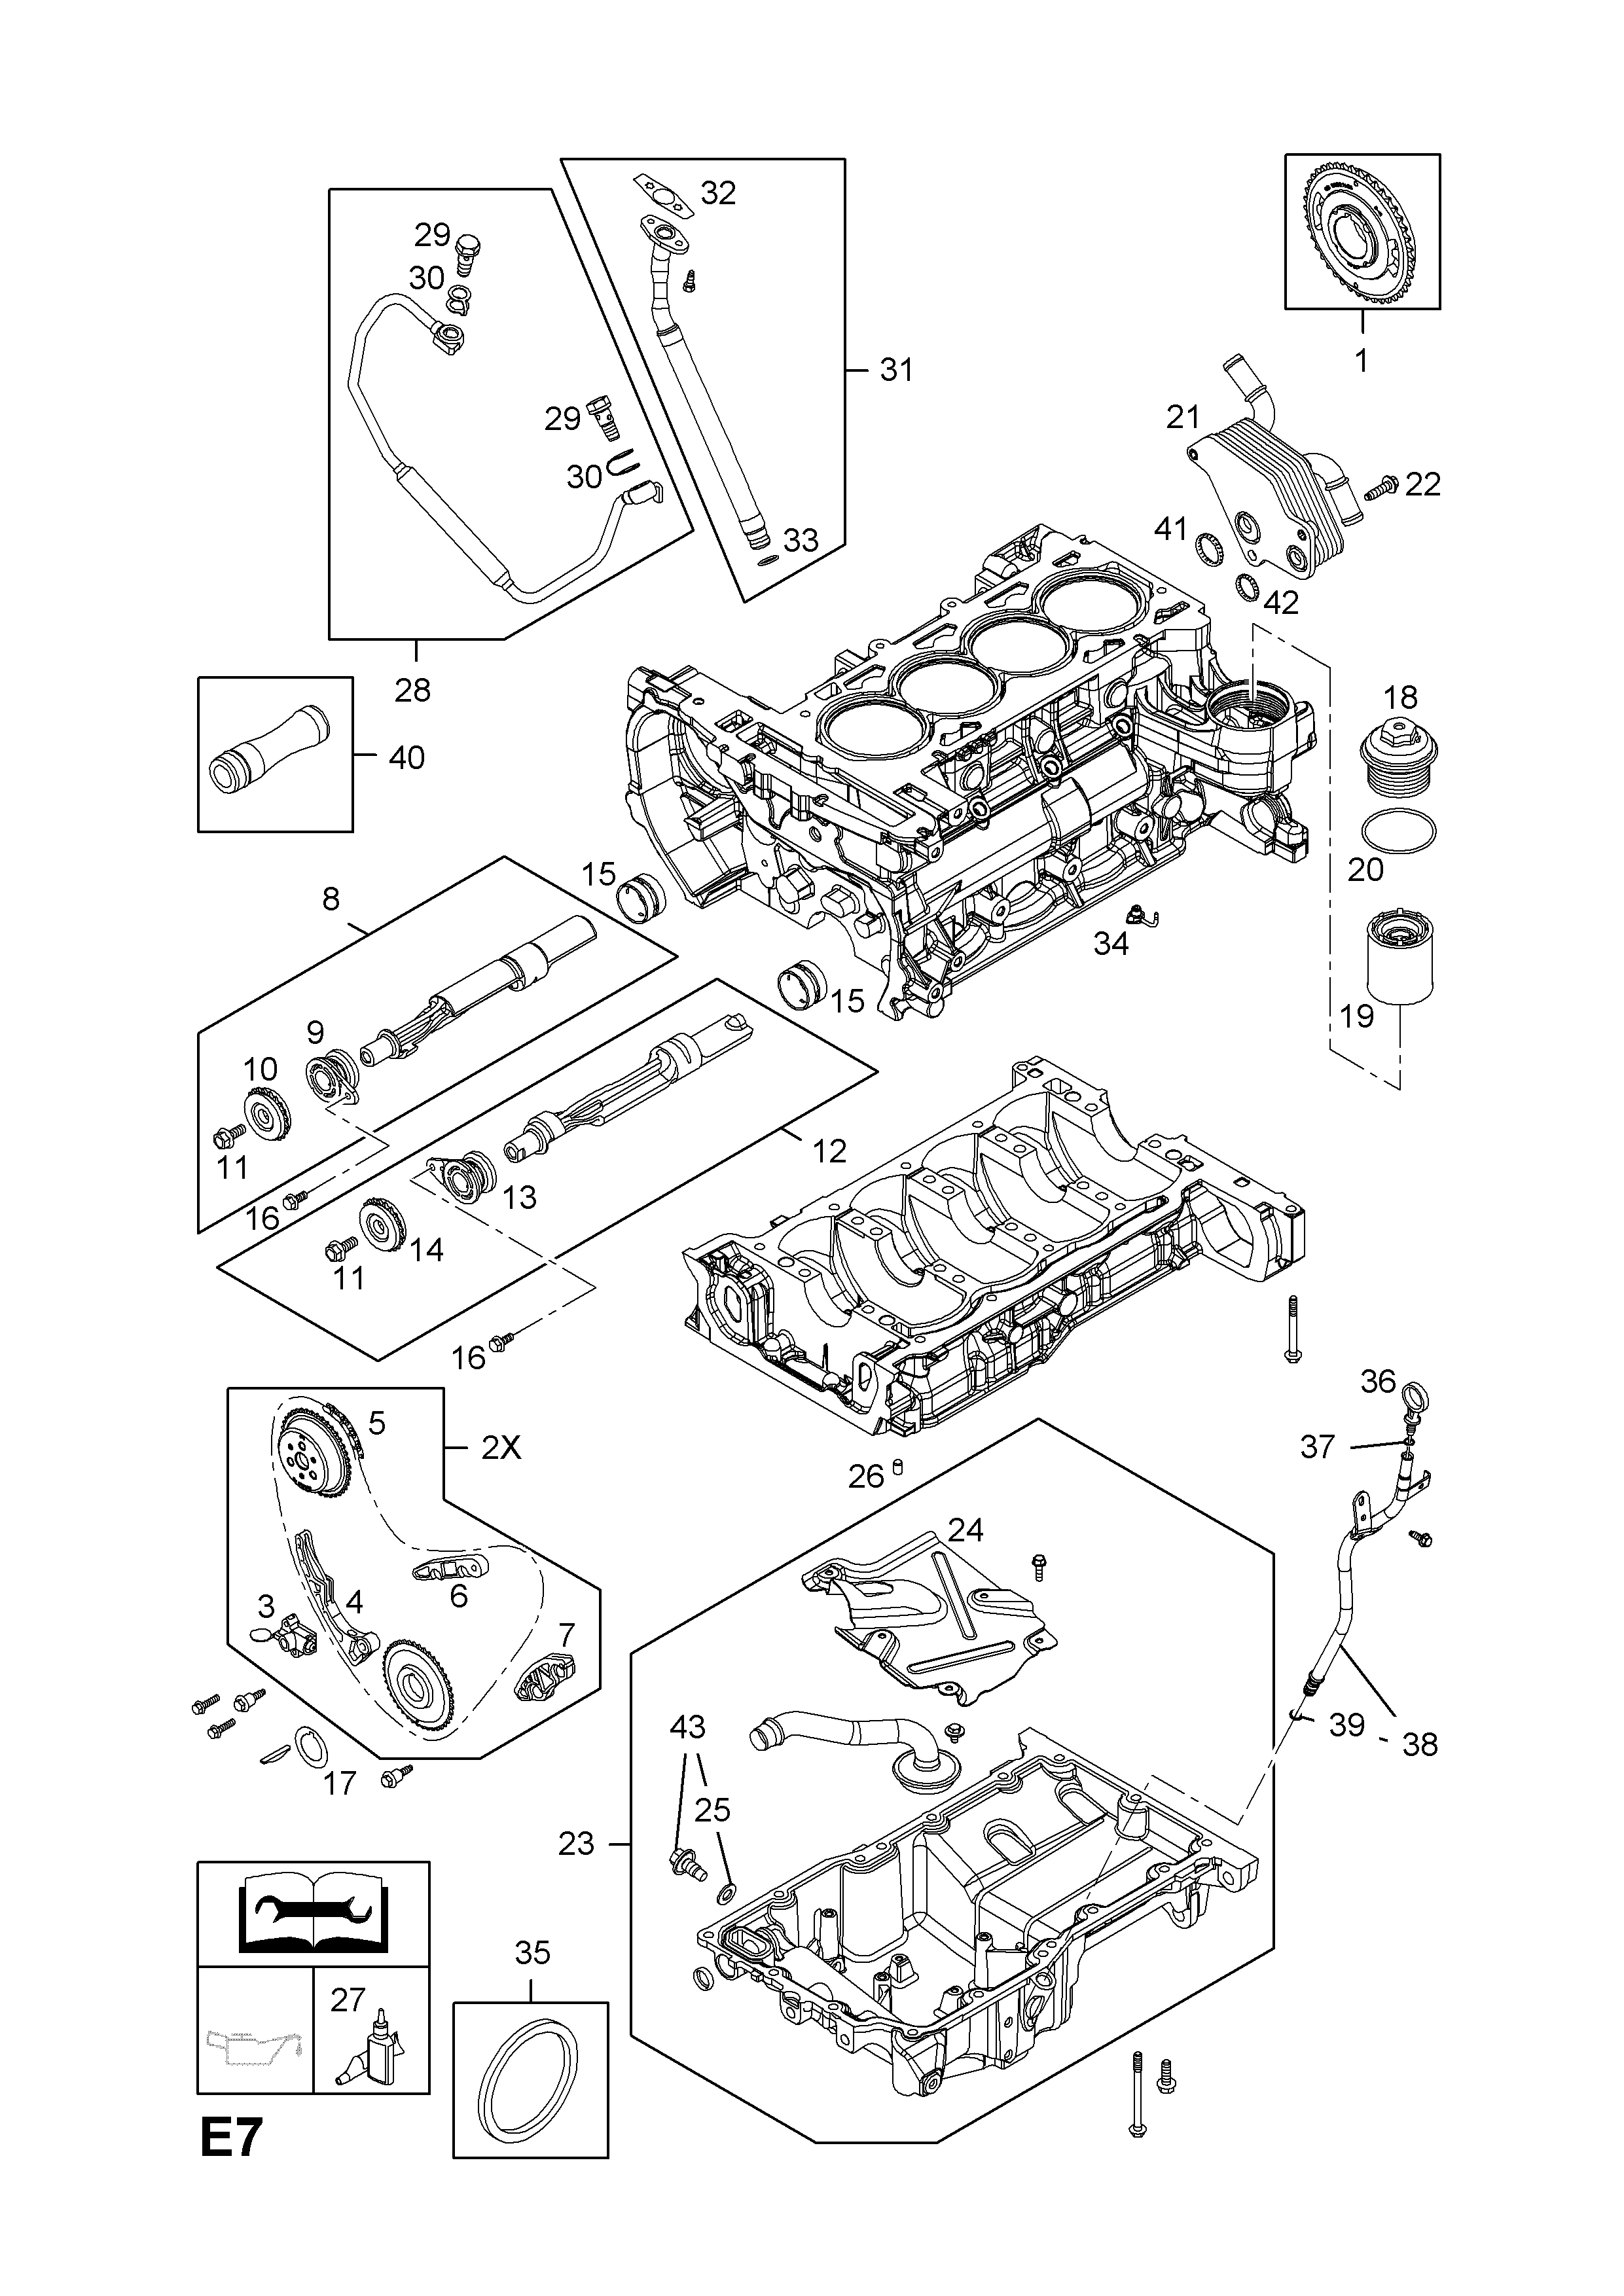 opel opel gt 2007 2009 e engine and clutch 1 z20nhh lnf Opel Insignia list of parts model opel opel gt